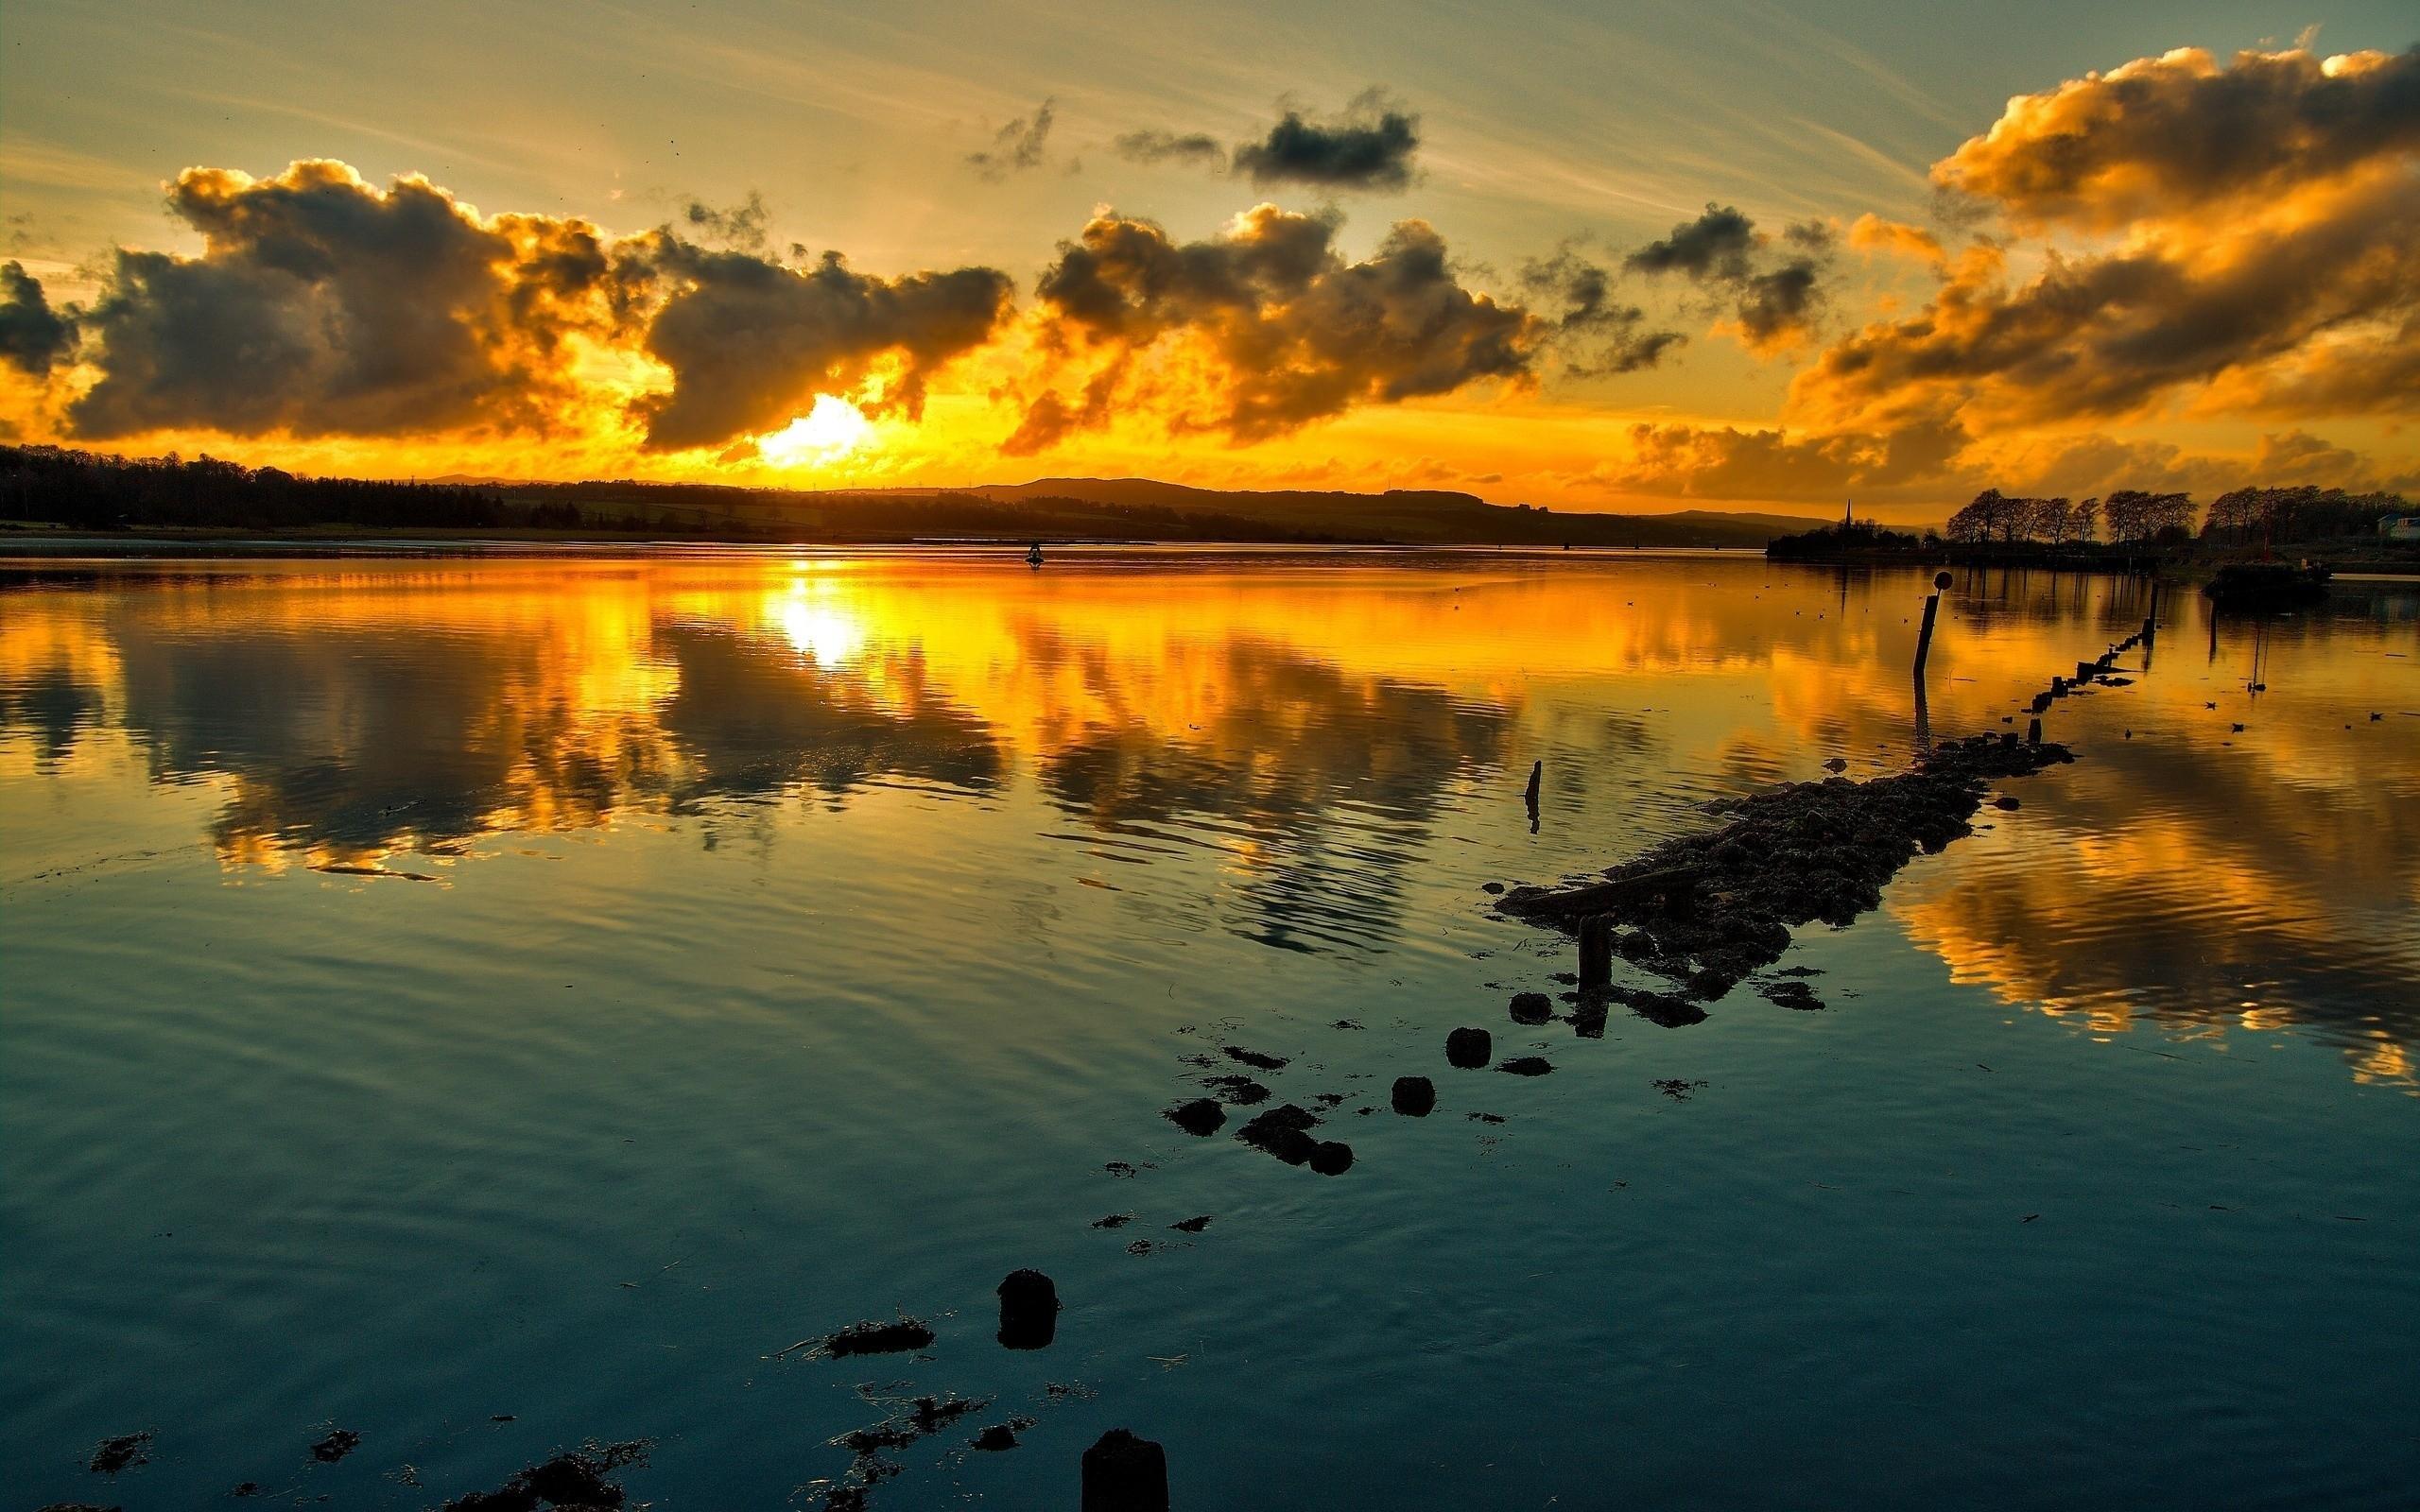 природа горизонт солнце озеро облака отражение  № 623510 бесплатно